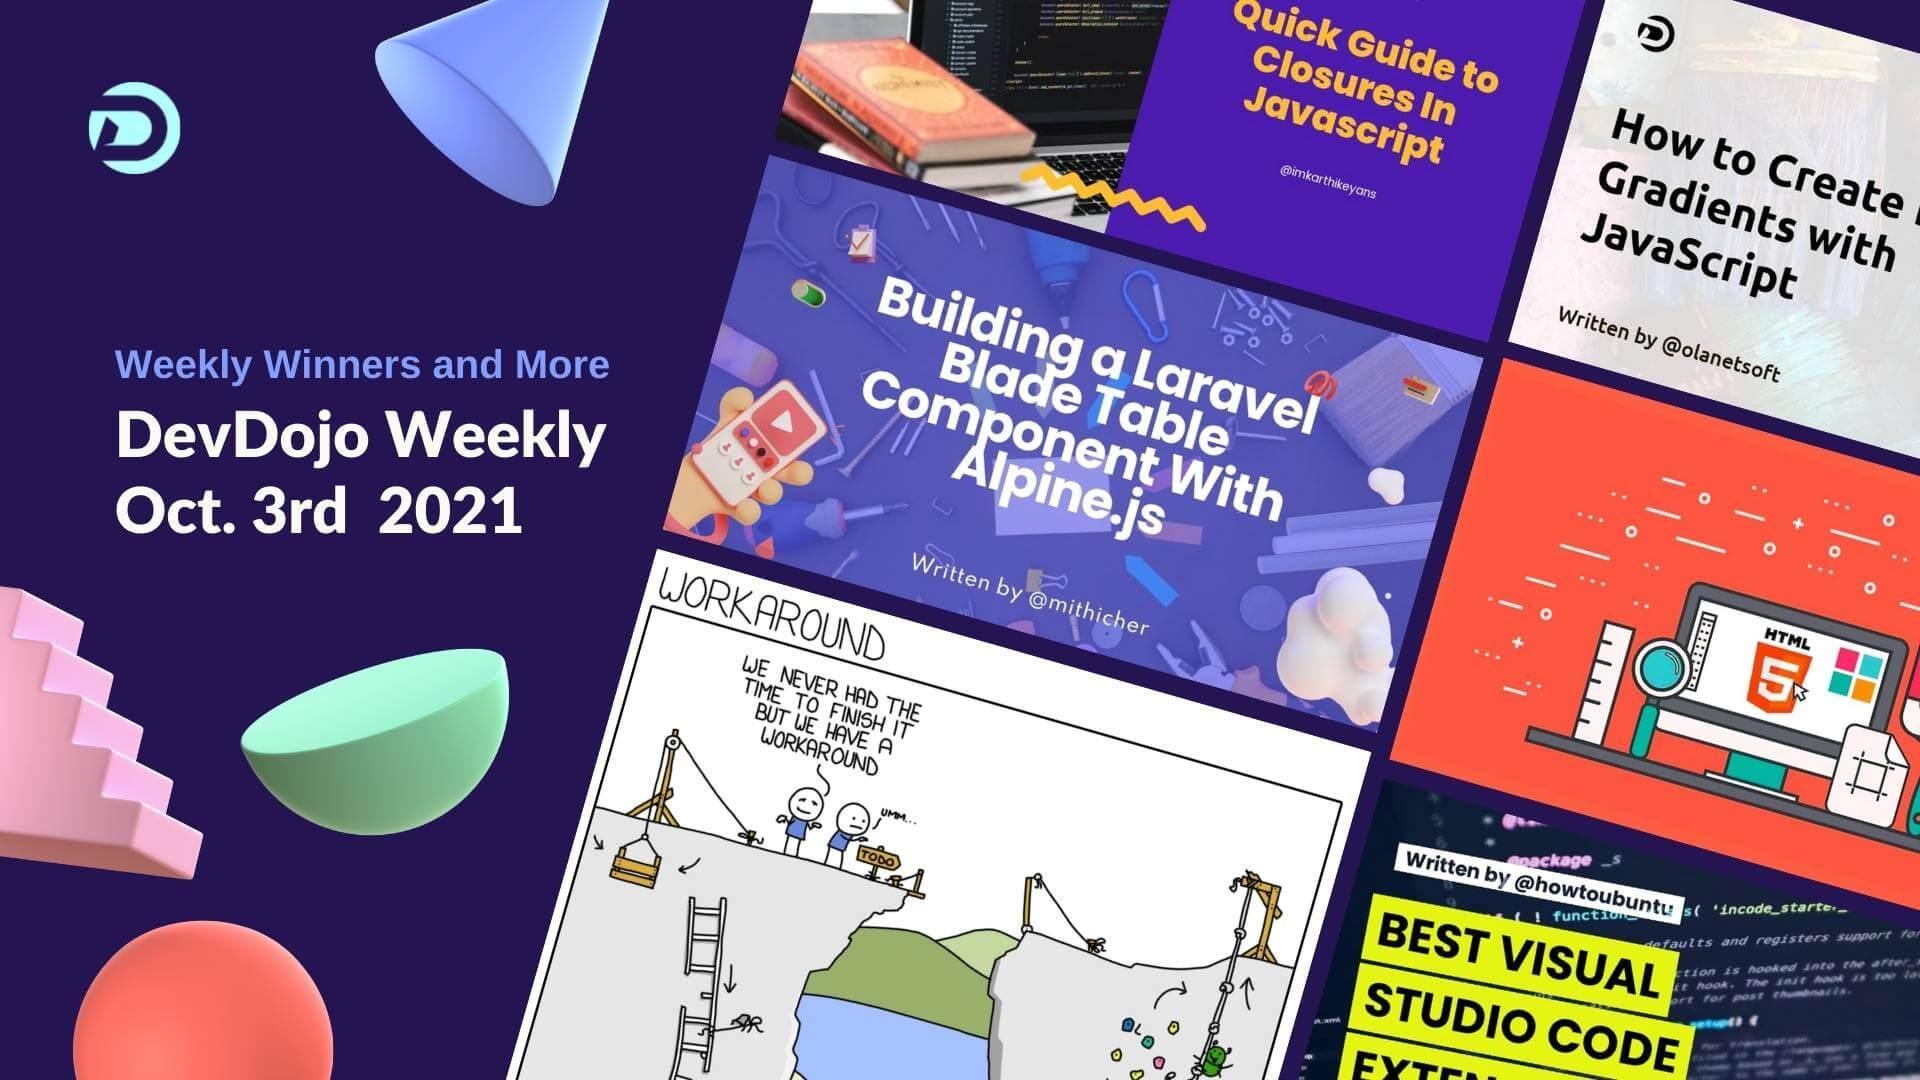 DevDojo Weekly - Oct. 10th  2021